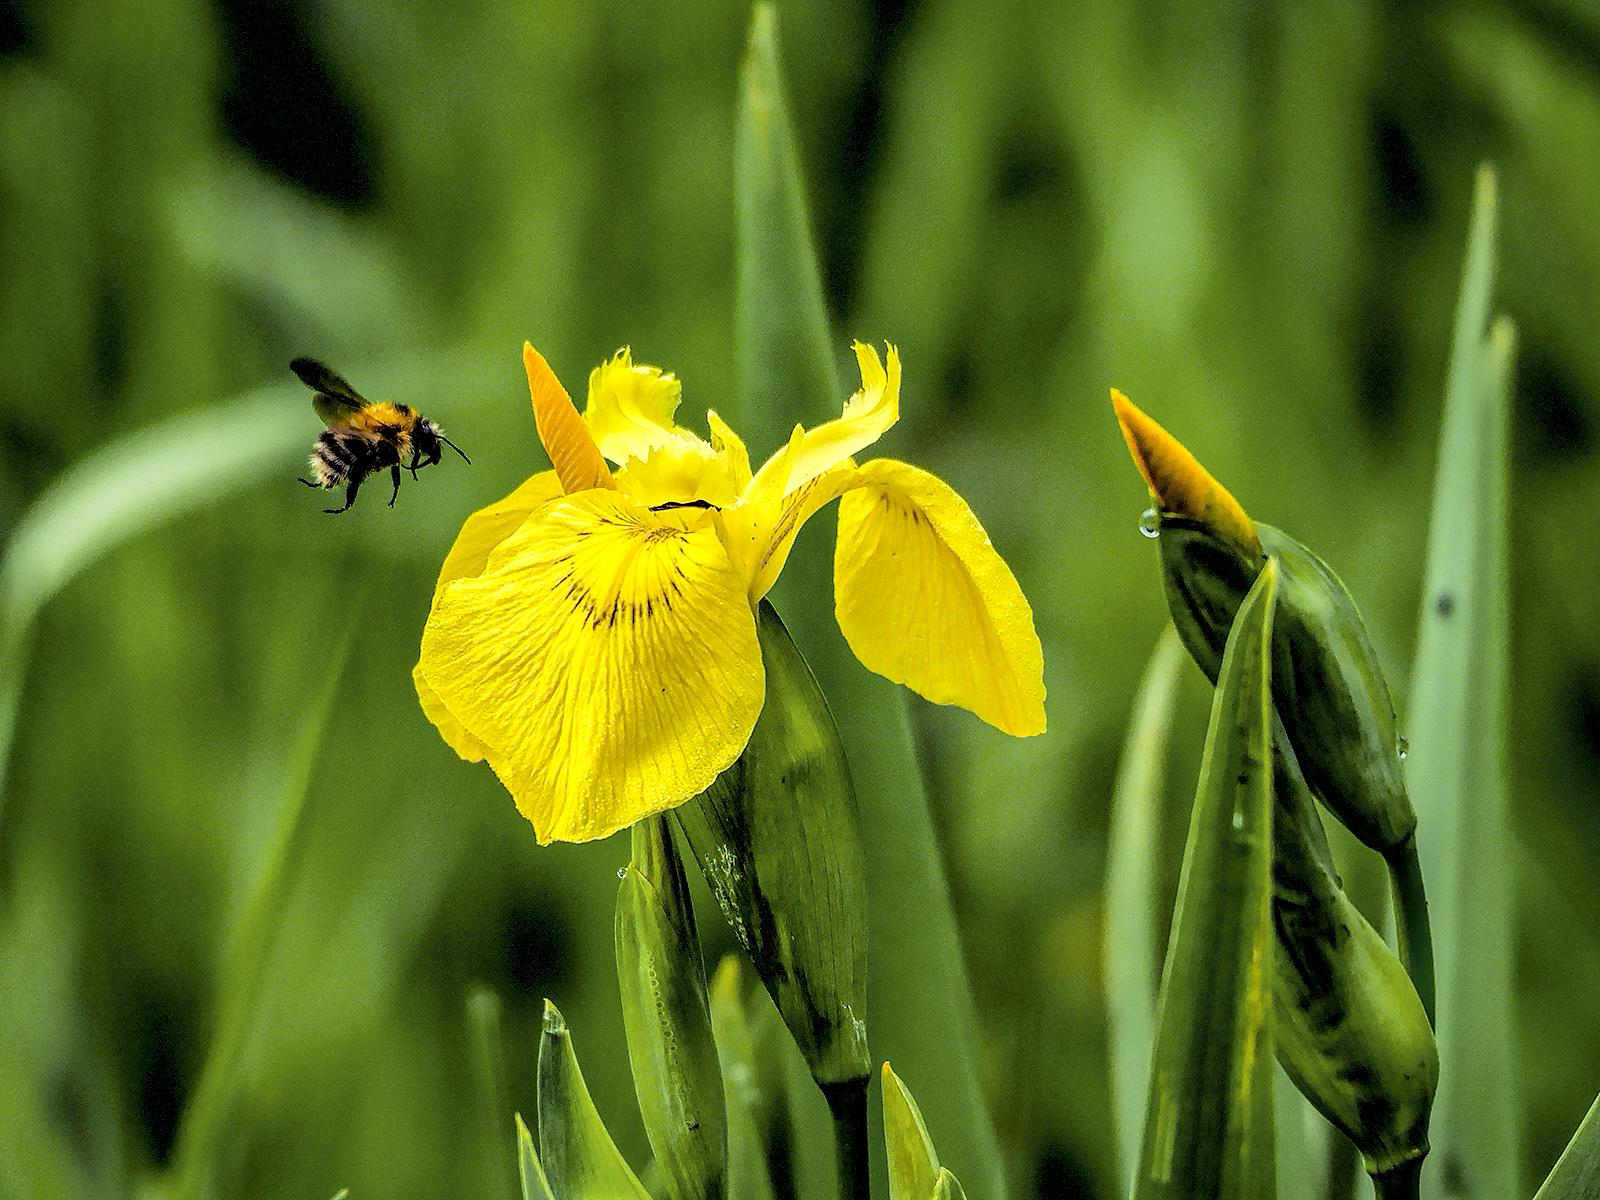 Iris and bumble bee